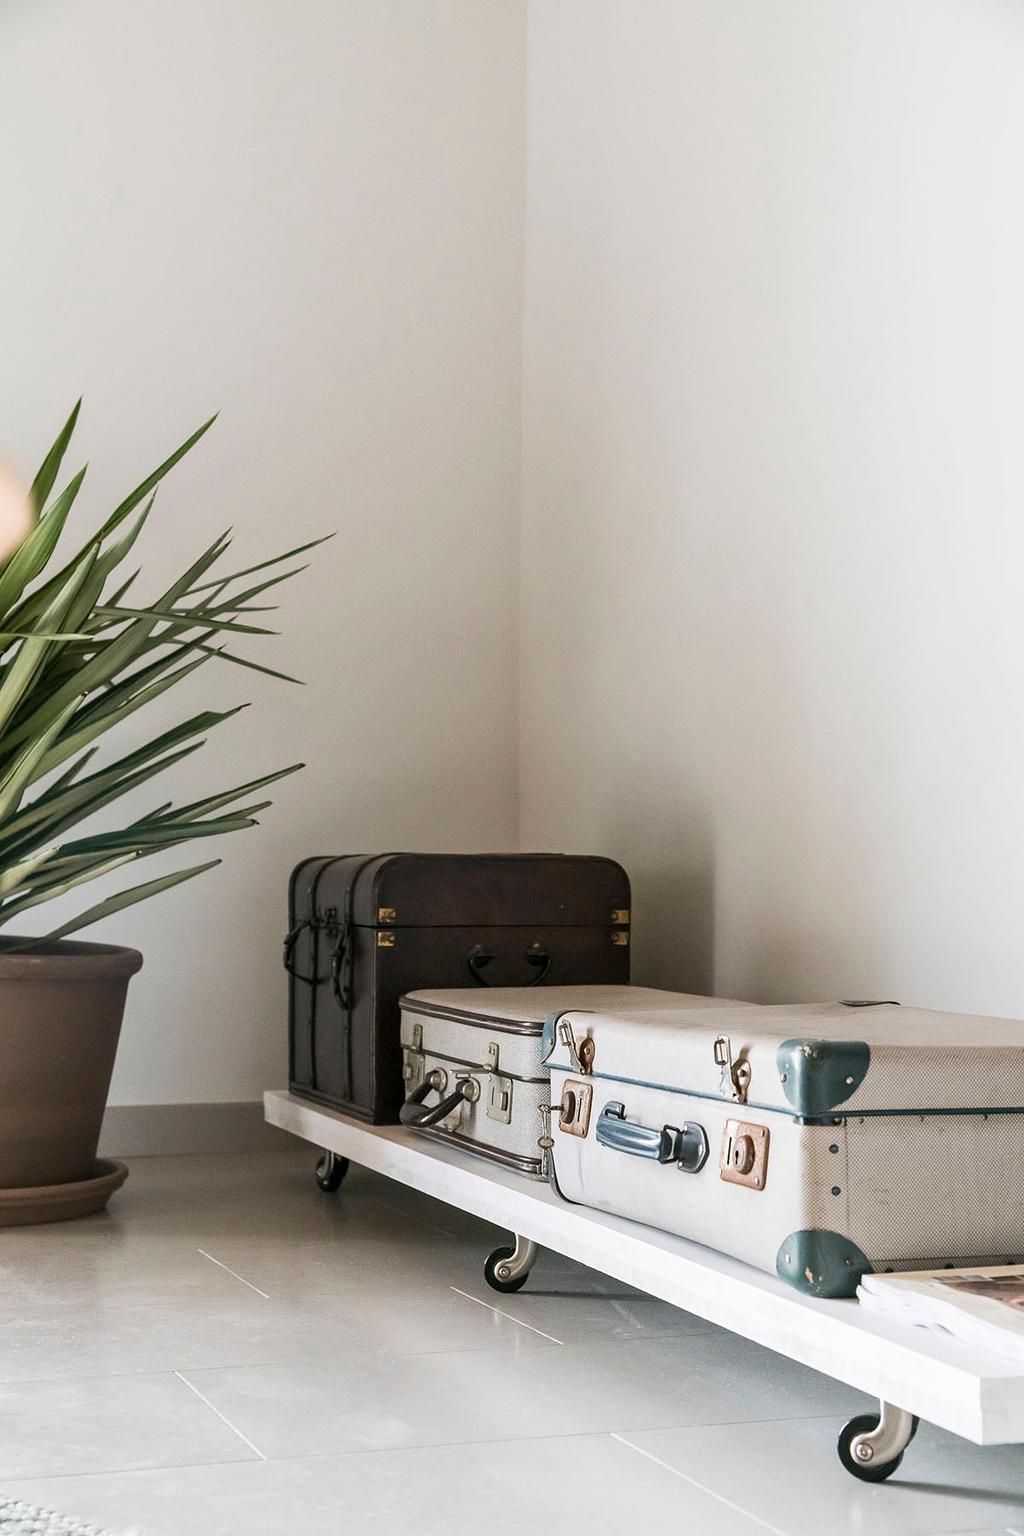 DIY kofferkast / Een frisse start met vtwonen / Jonah Samyn